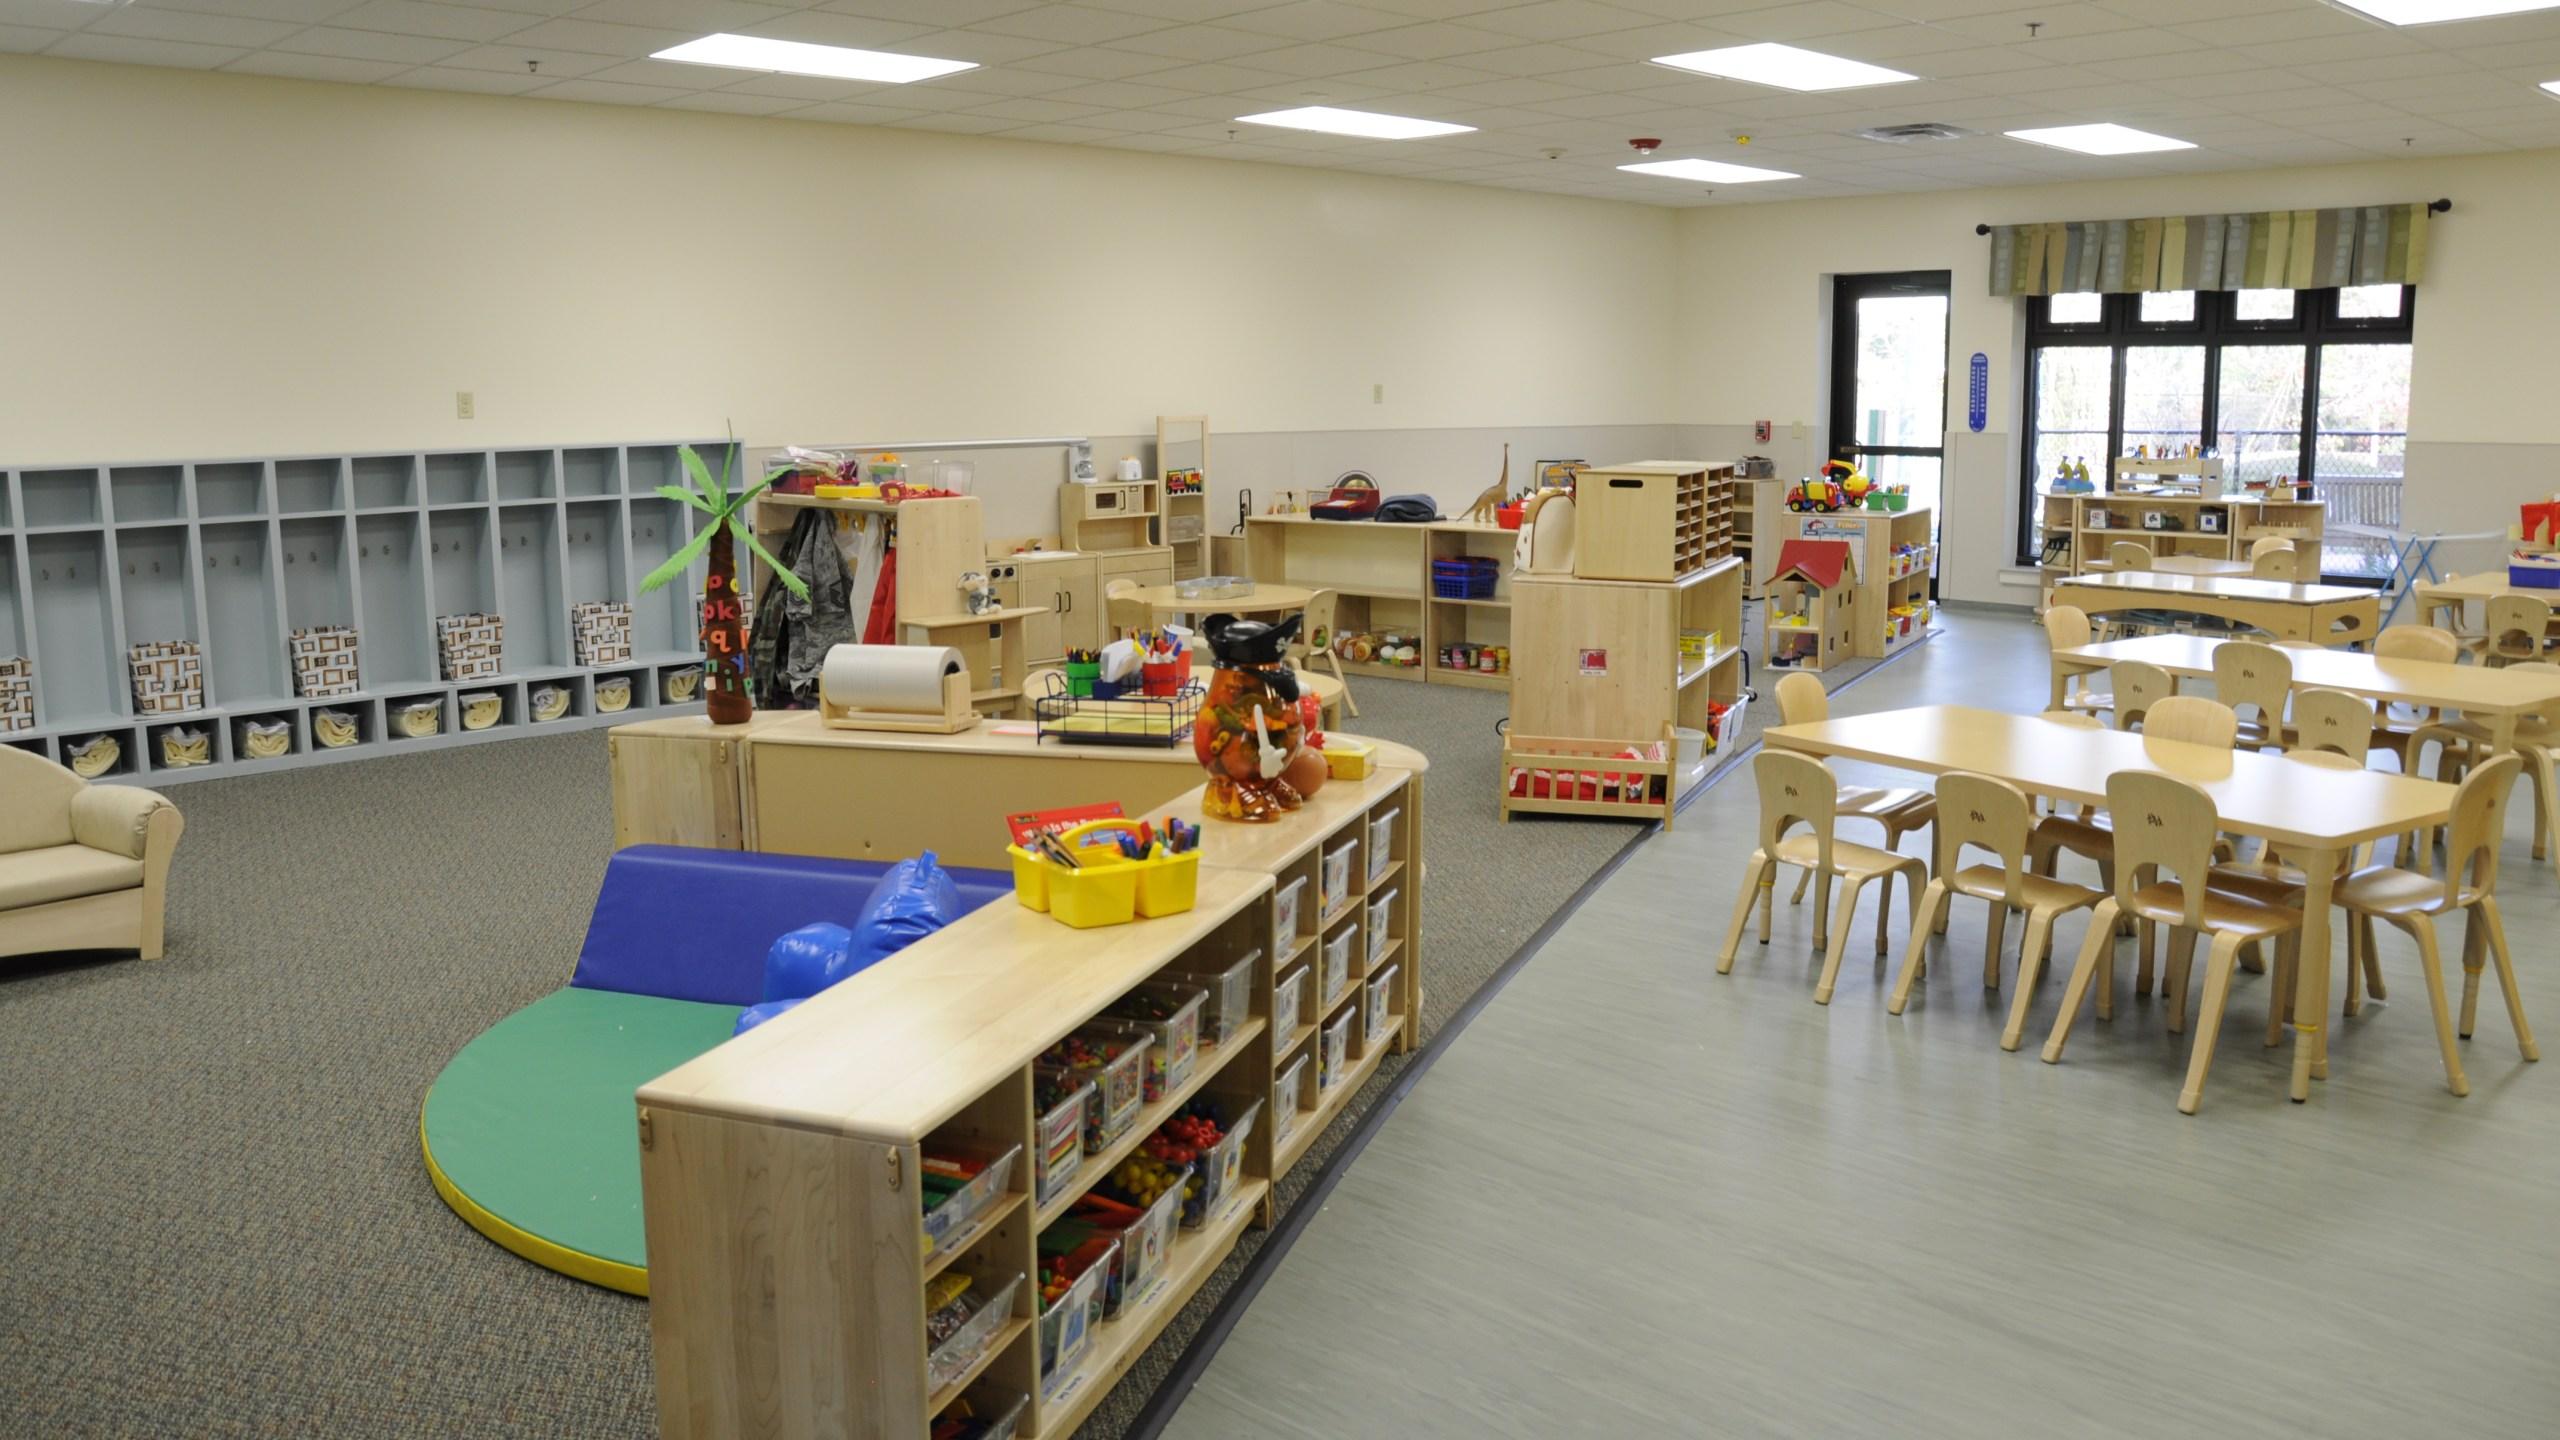 Childcare center generic image_1531209119311.JPG.jpg